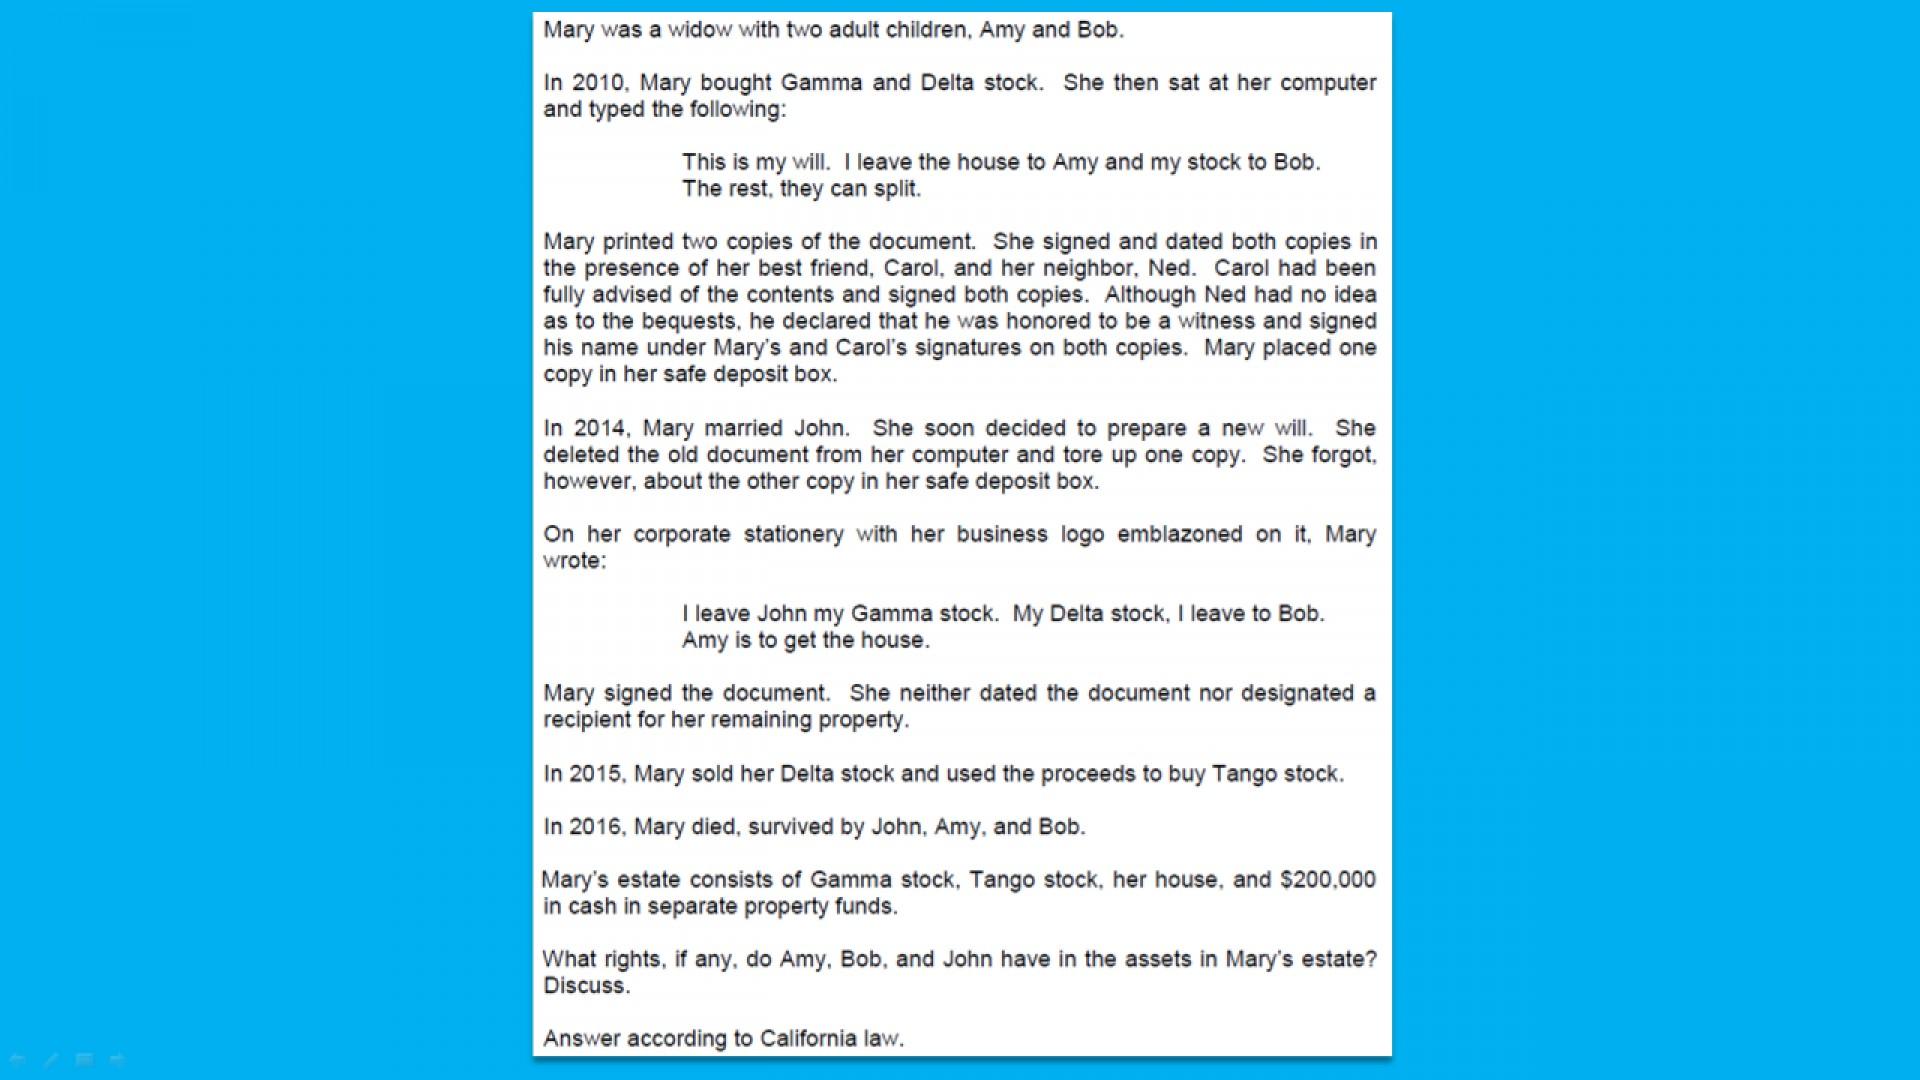 002 California Bar Essays Fizo8ngptrkpbhjfw6id Firstframe Essay Marvelous Exam Graded February 2018 How Are 1920